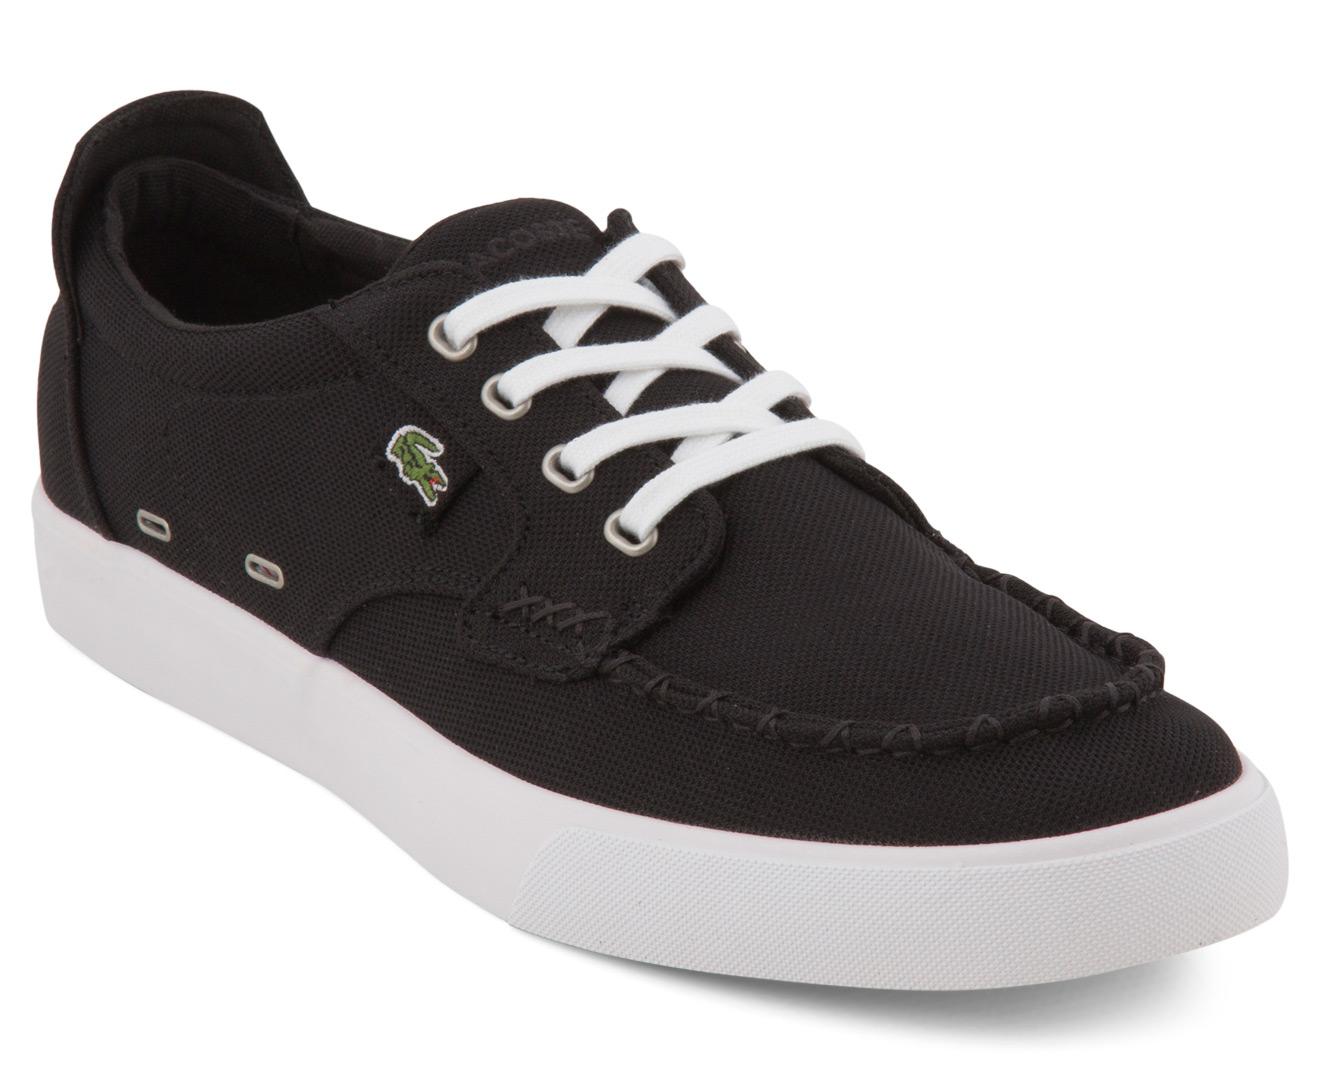 Lacoste Shoes Online Shopping Australia